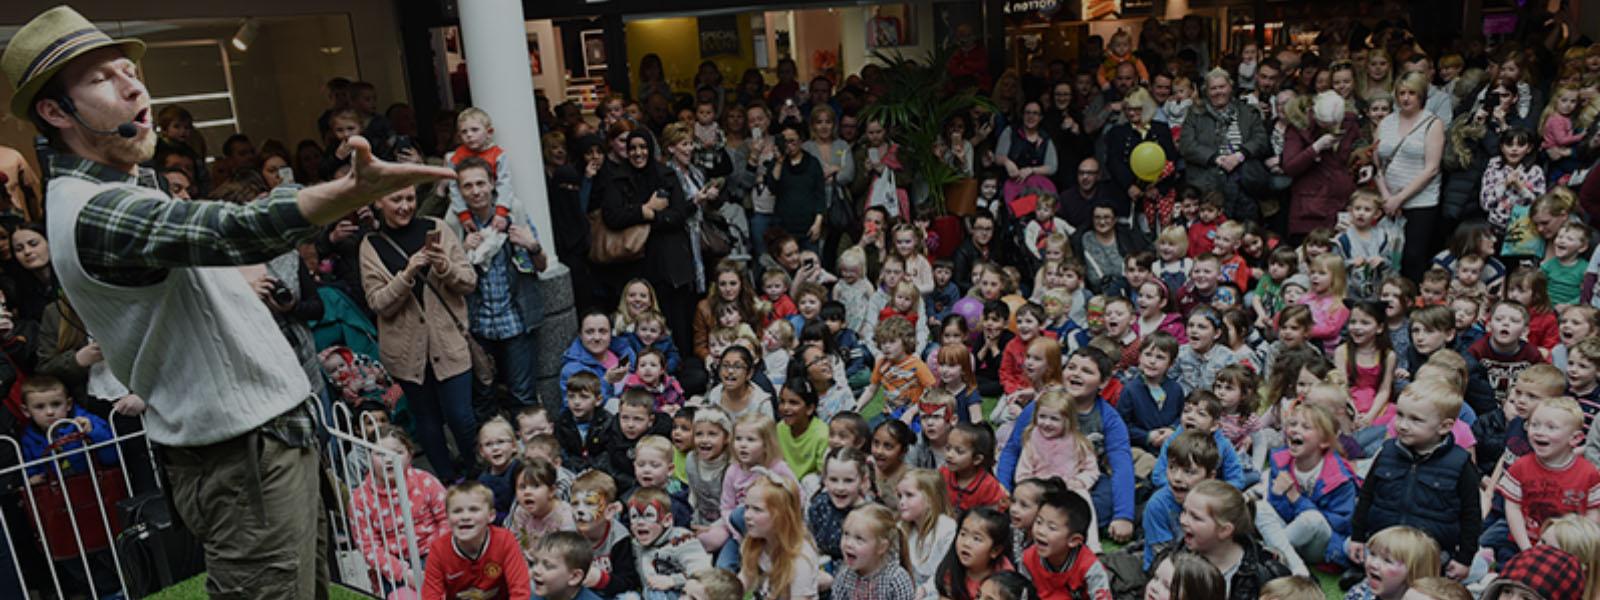 Mr Bloom CBeebies Entertains a Shopping Centre